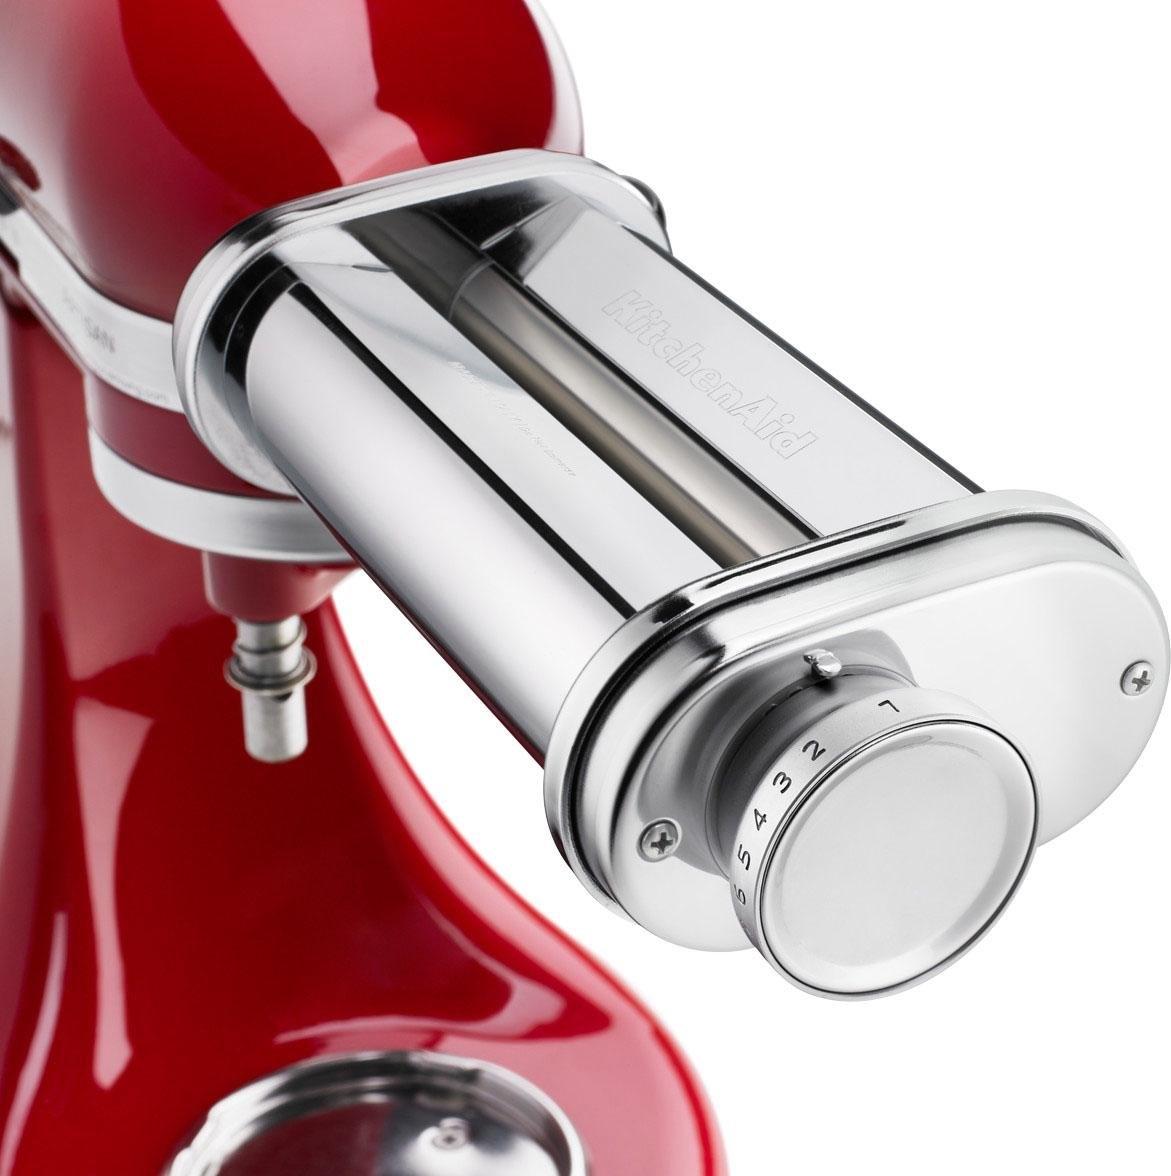 KitchenAid pastaroller 5KSMPSA, accessoire voor alle KitchenAid-keukenmachines in de webshop van OTTO kopen